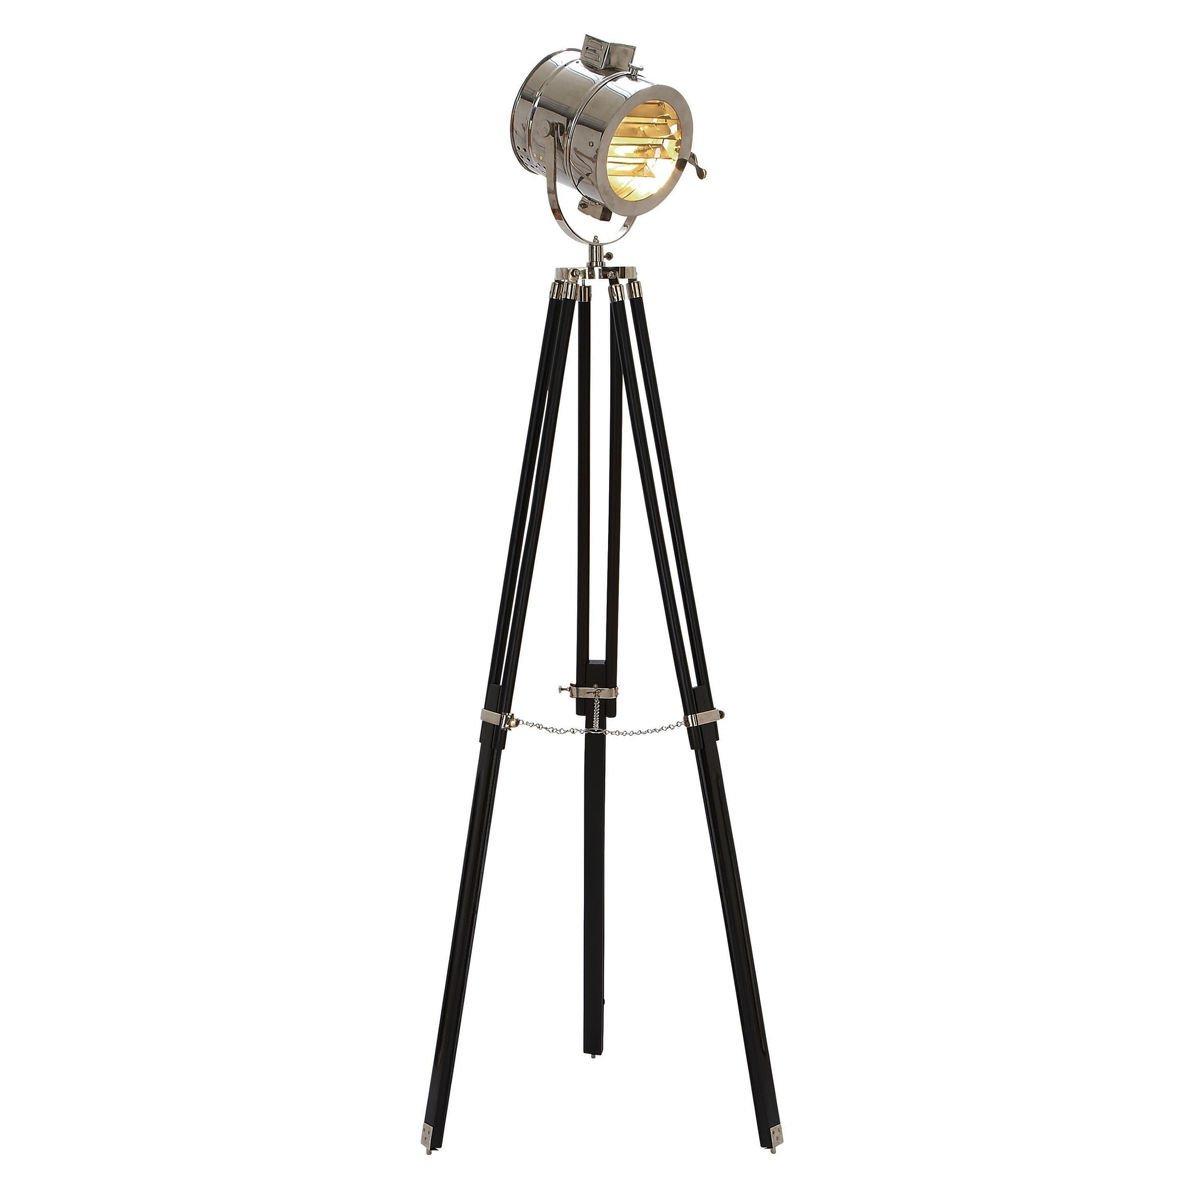 Generic urban designs studio light 70 decorative prop light w generic urban designs studio light 70 decorative prop light w tripod floor lamp amazon lighting aloadofball Gallery